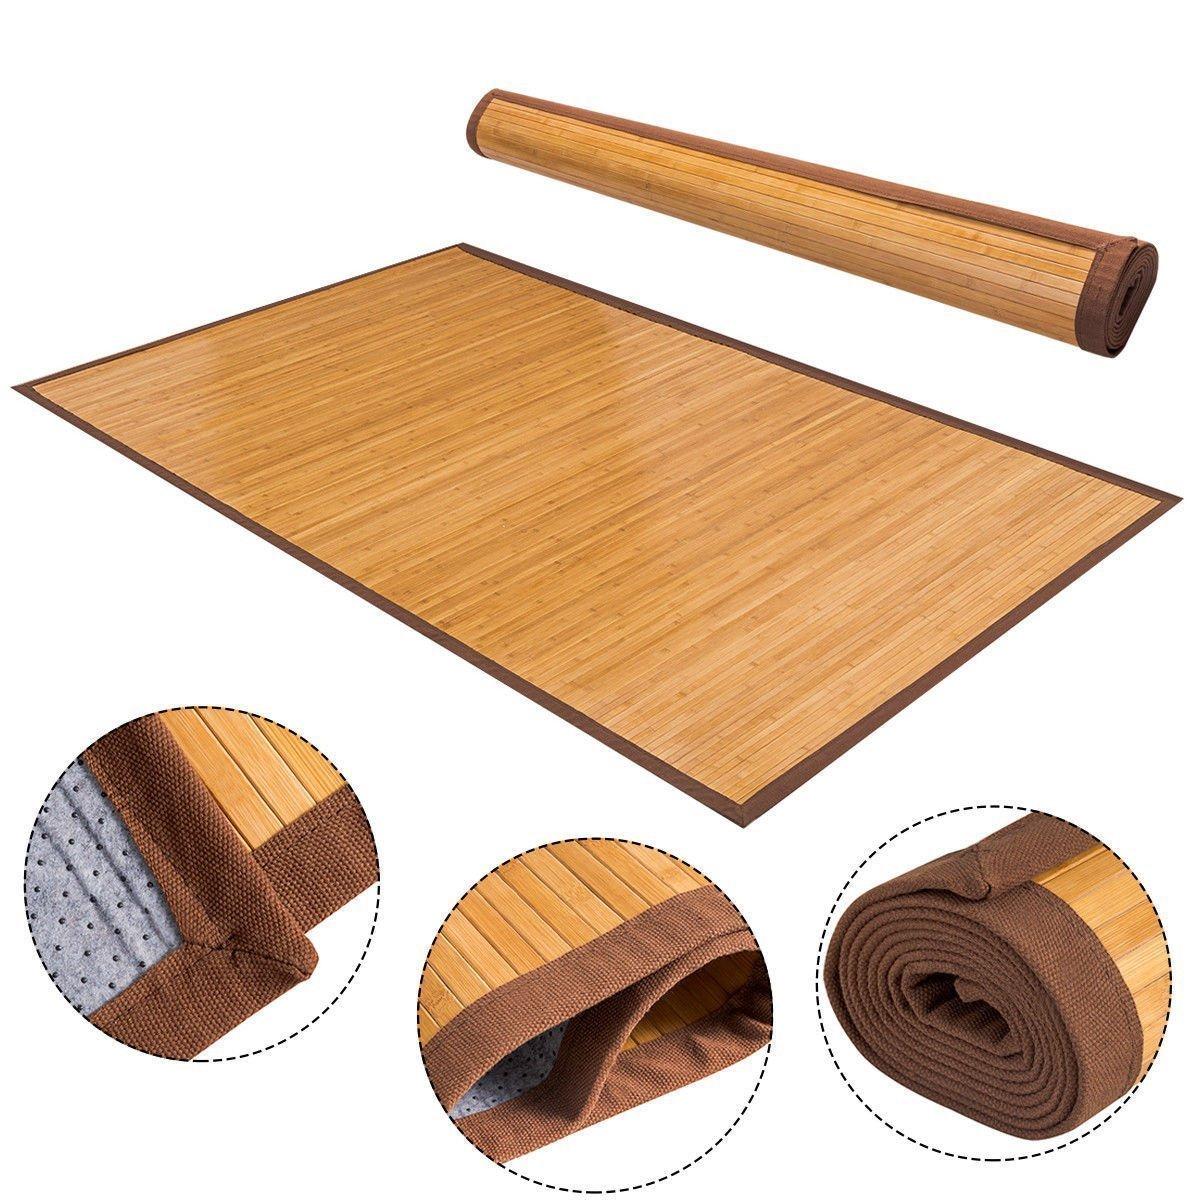 "Giantex 60"" x 96"" Bamboo Area Rug Floor Carpet Natural Bamboo Wood Indoor Outdoor"